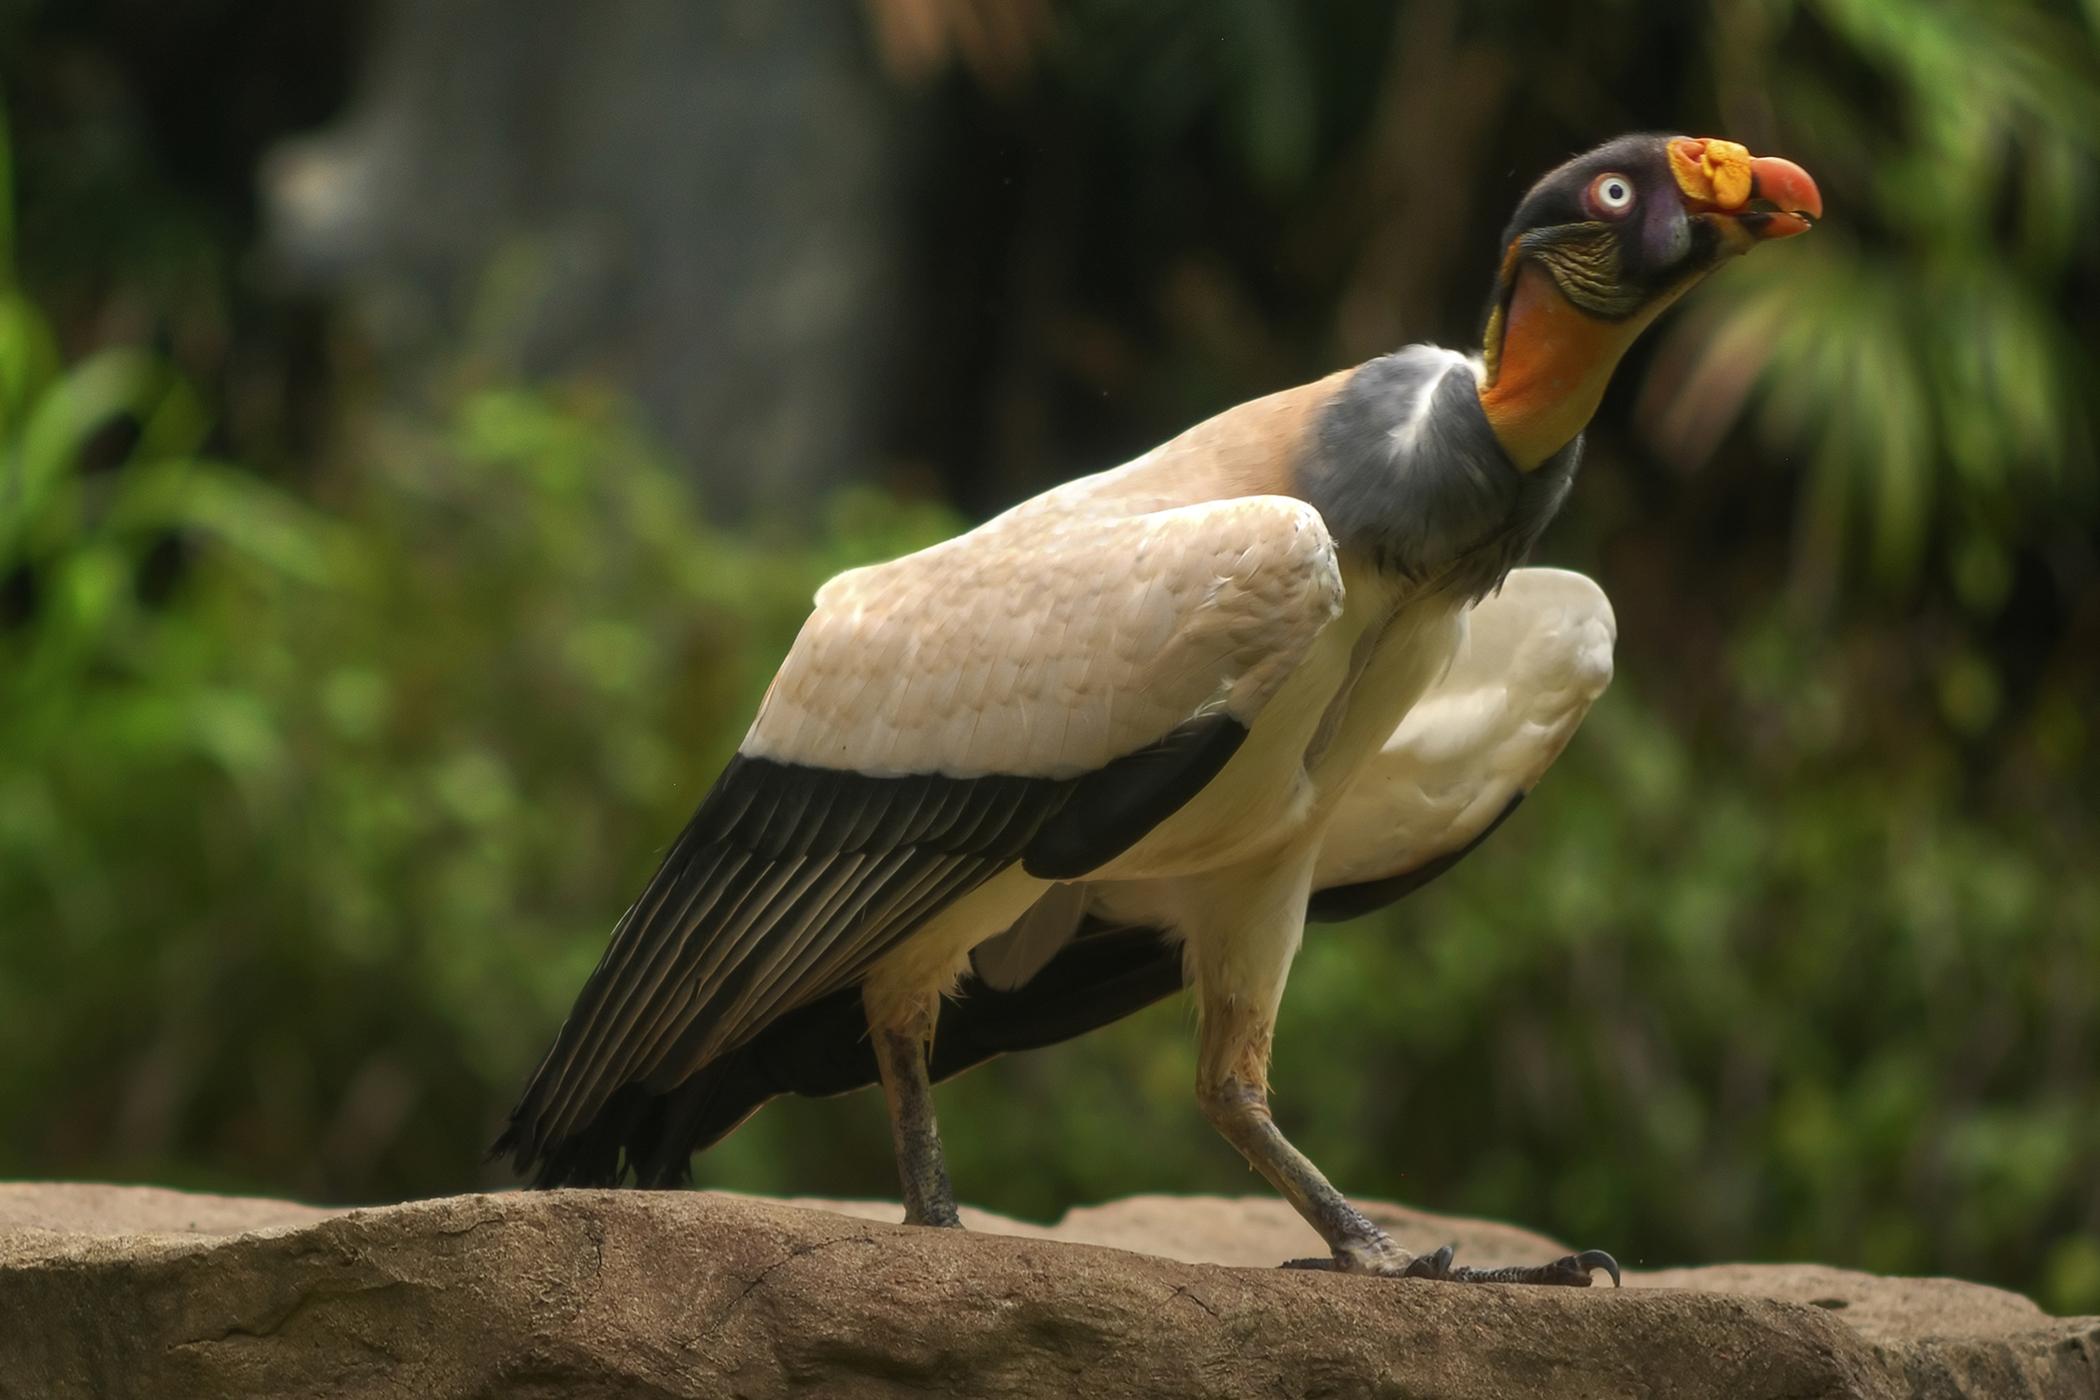 Renal Carcinoma in Birds